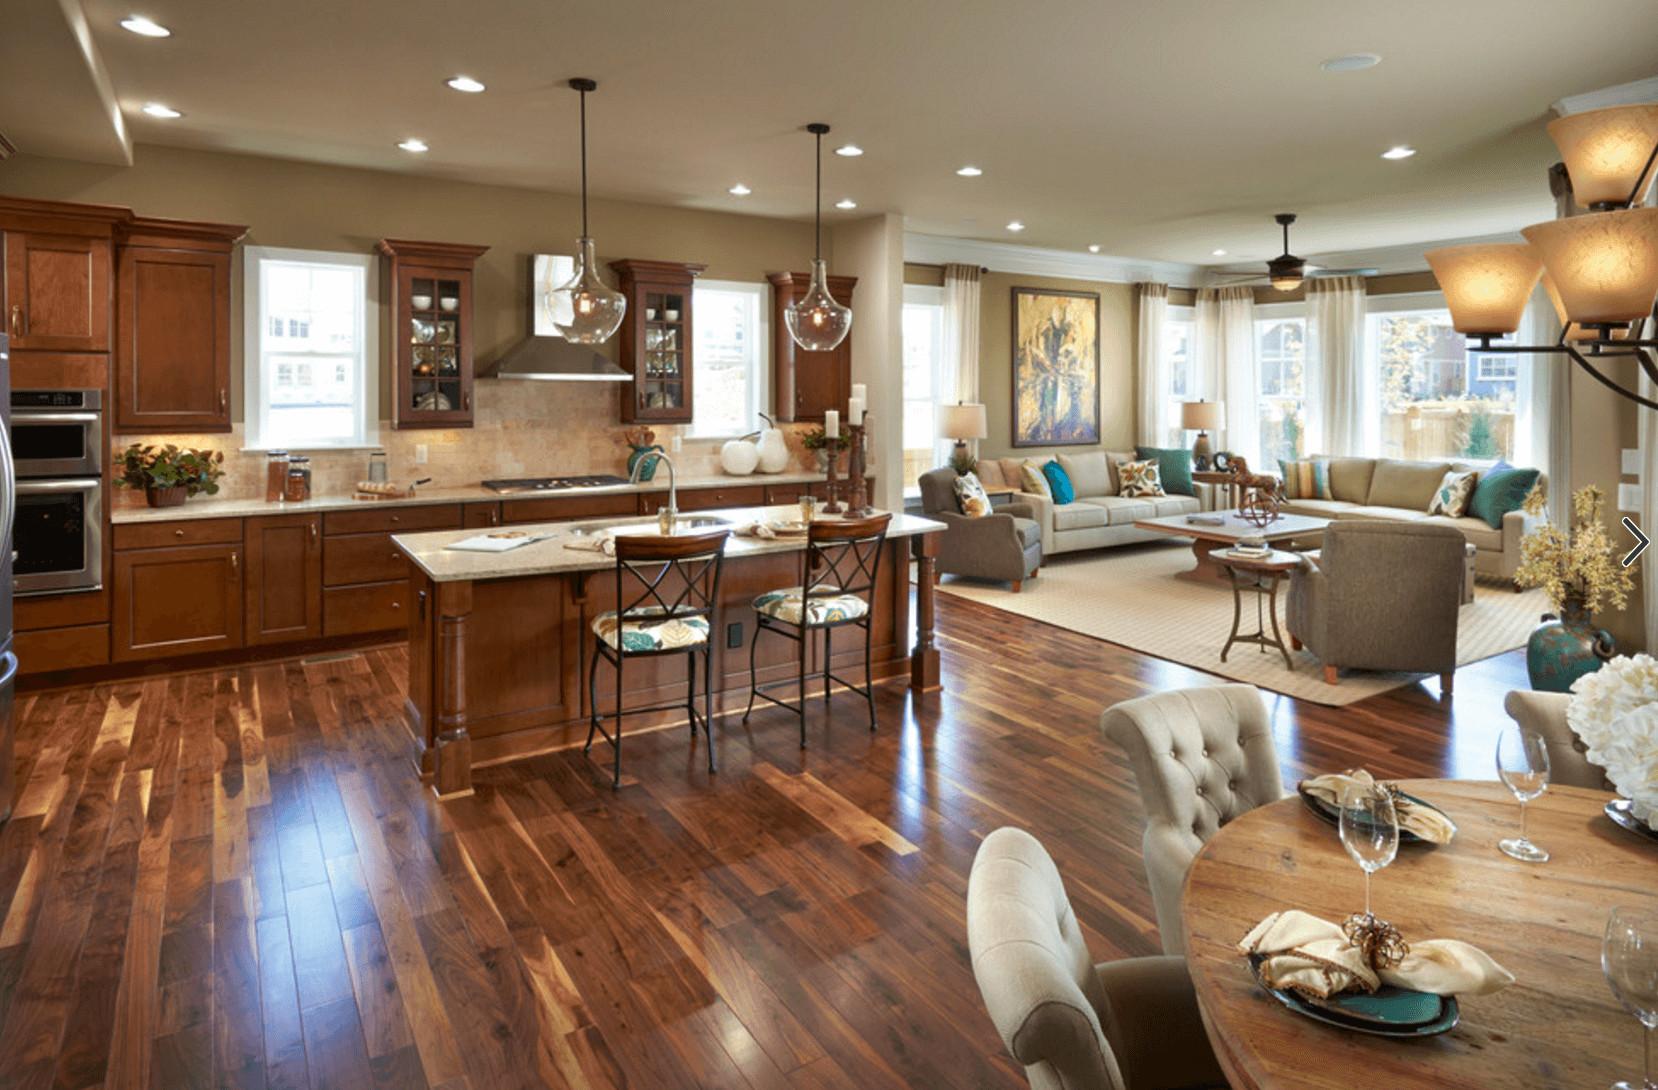 engineered hardwood flooring barrie of gleaming wood flooring ties the space together 6 great reasons to in gleaming wood flooring ties the space together 6 great reasons to love an open floor plan